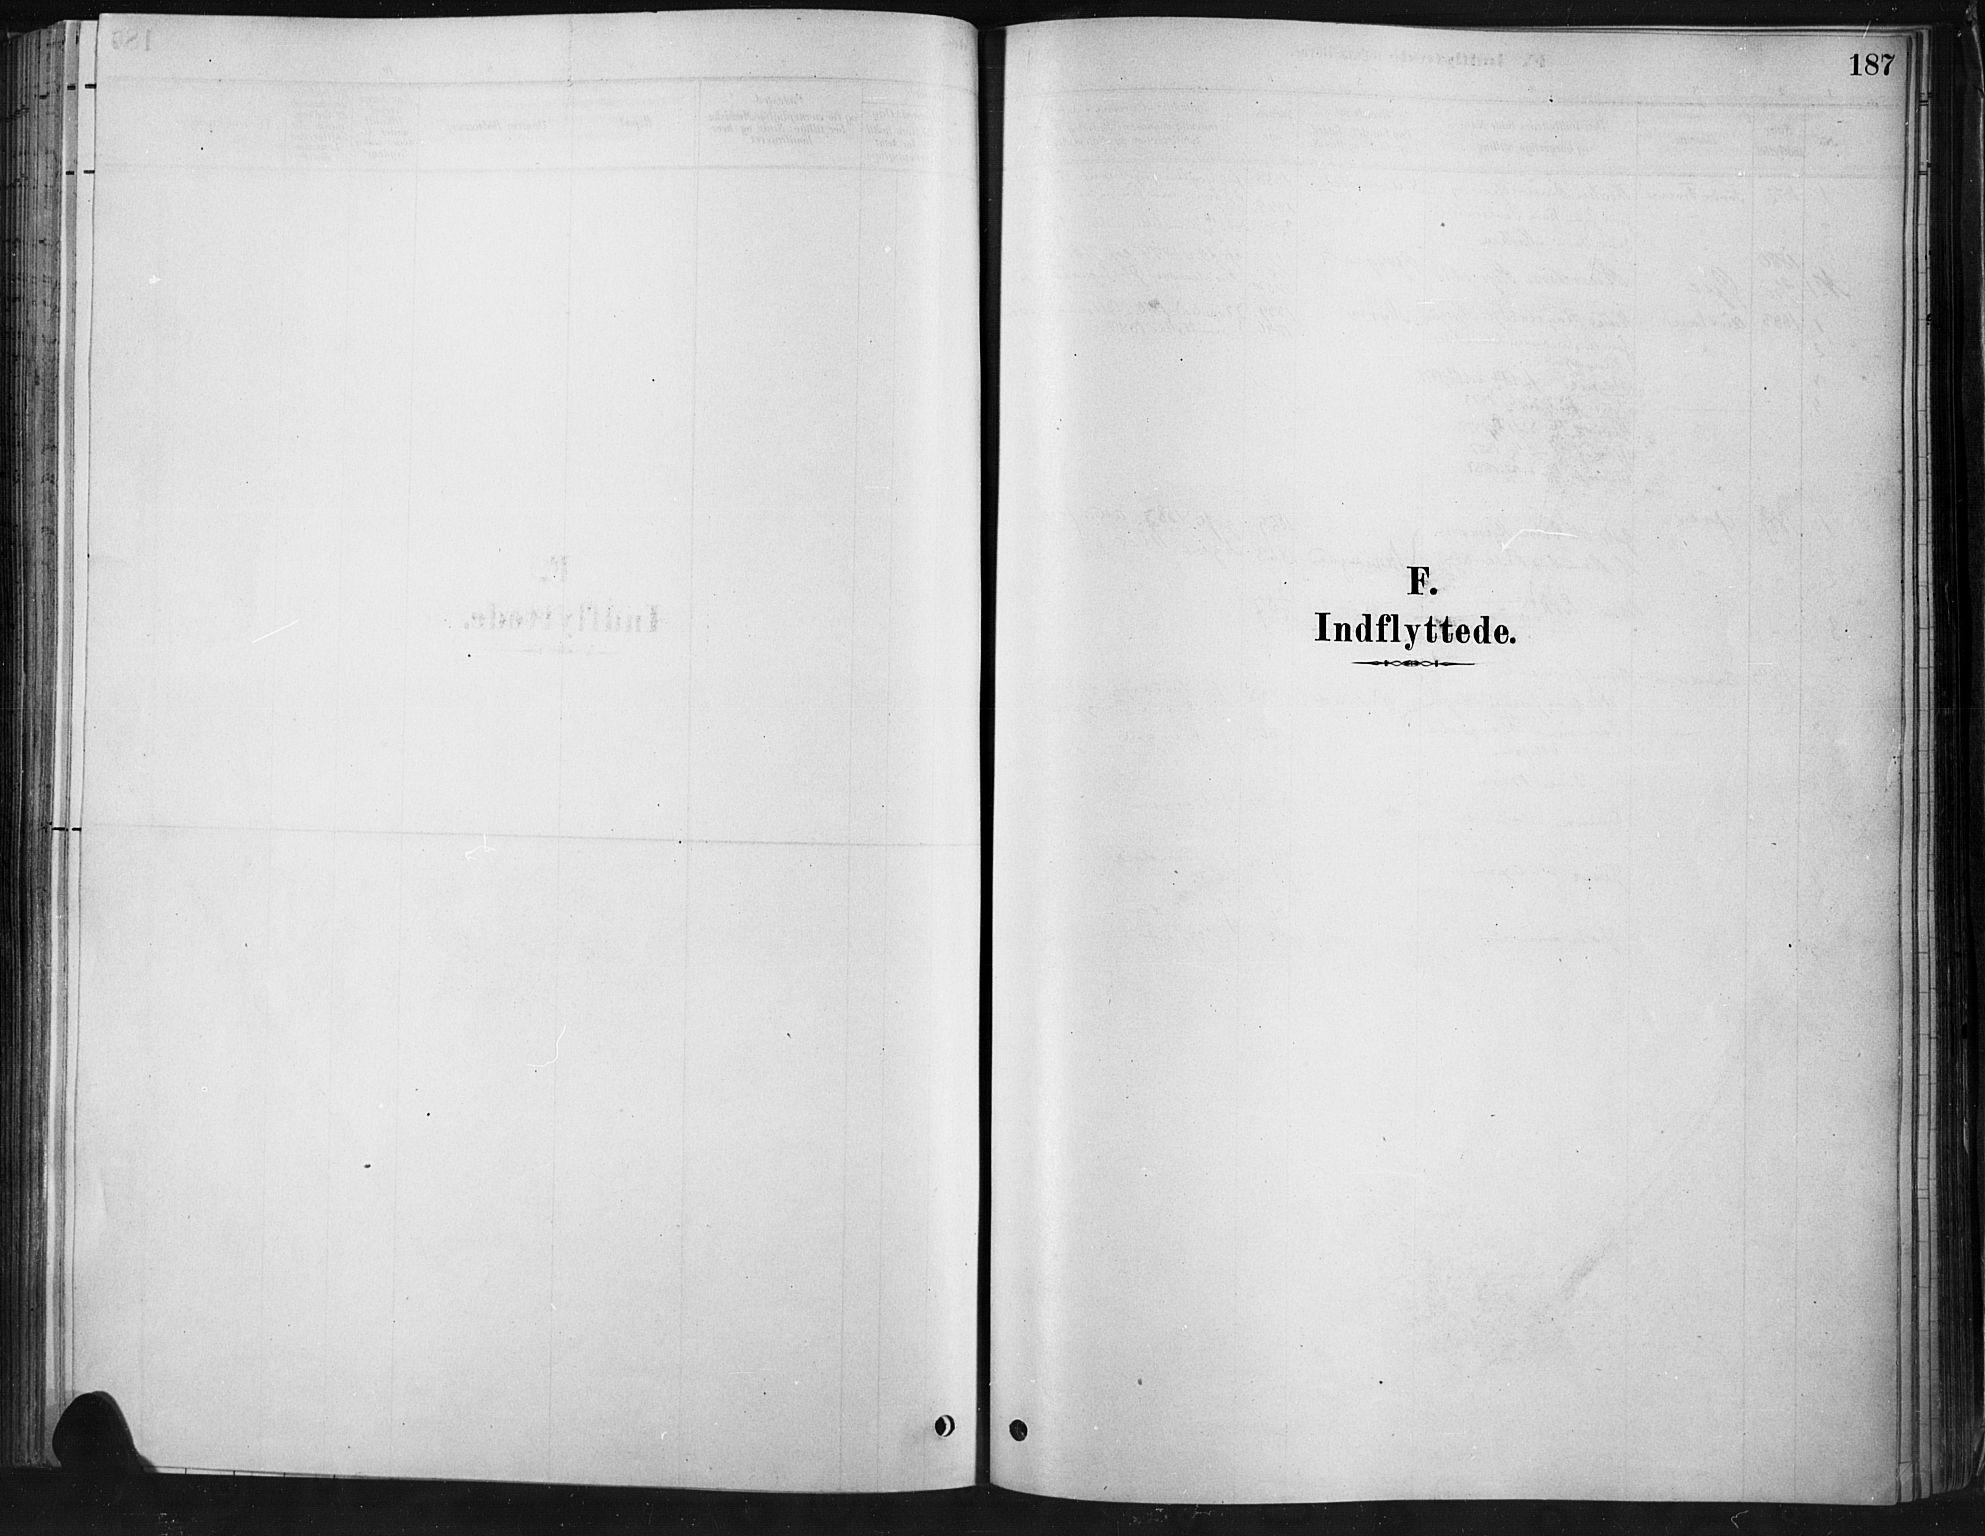 SAH, Ringebu prestekontor, Ministerialbok nr. 9, 1878-1898, s. 187